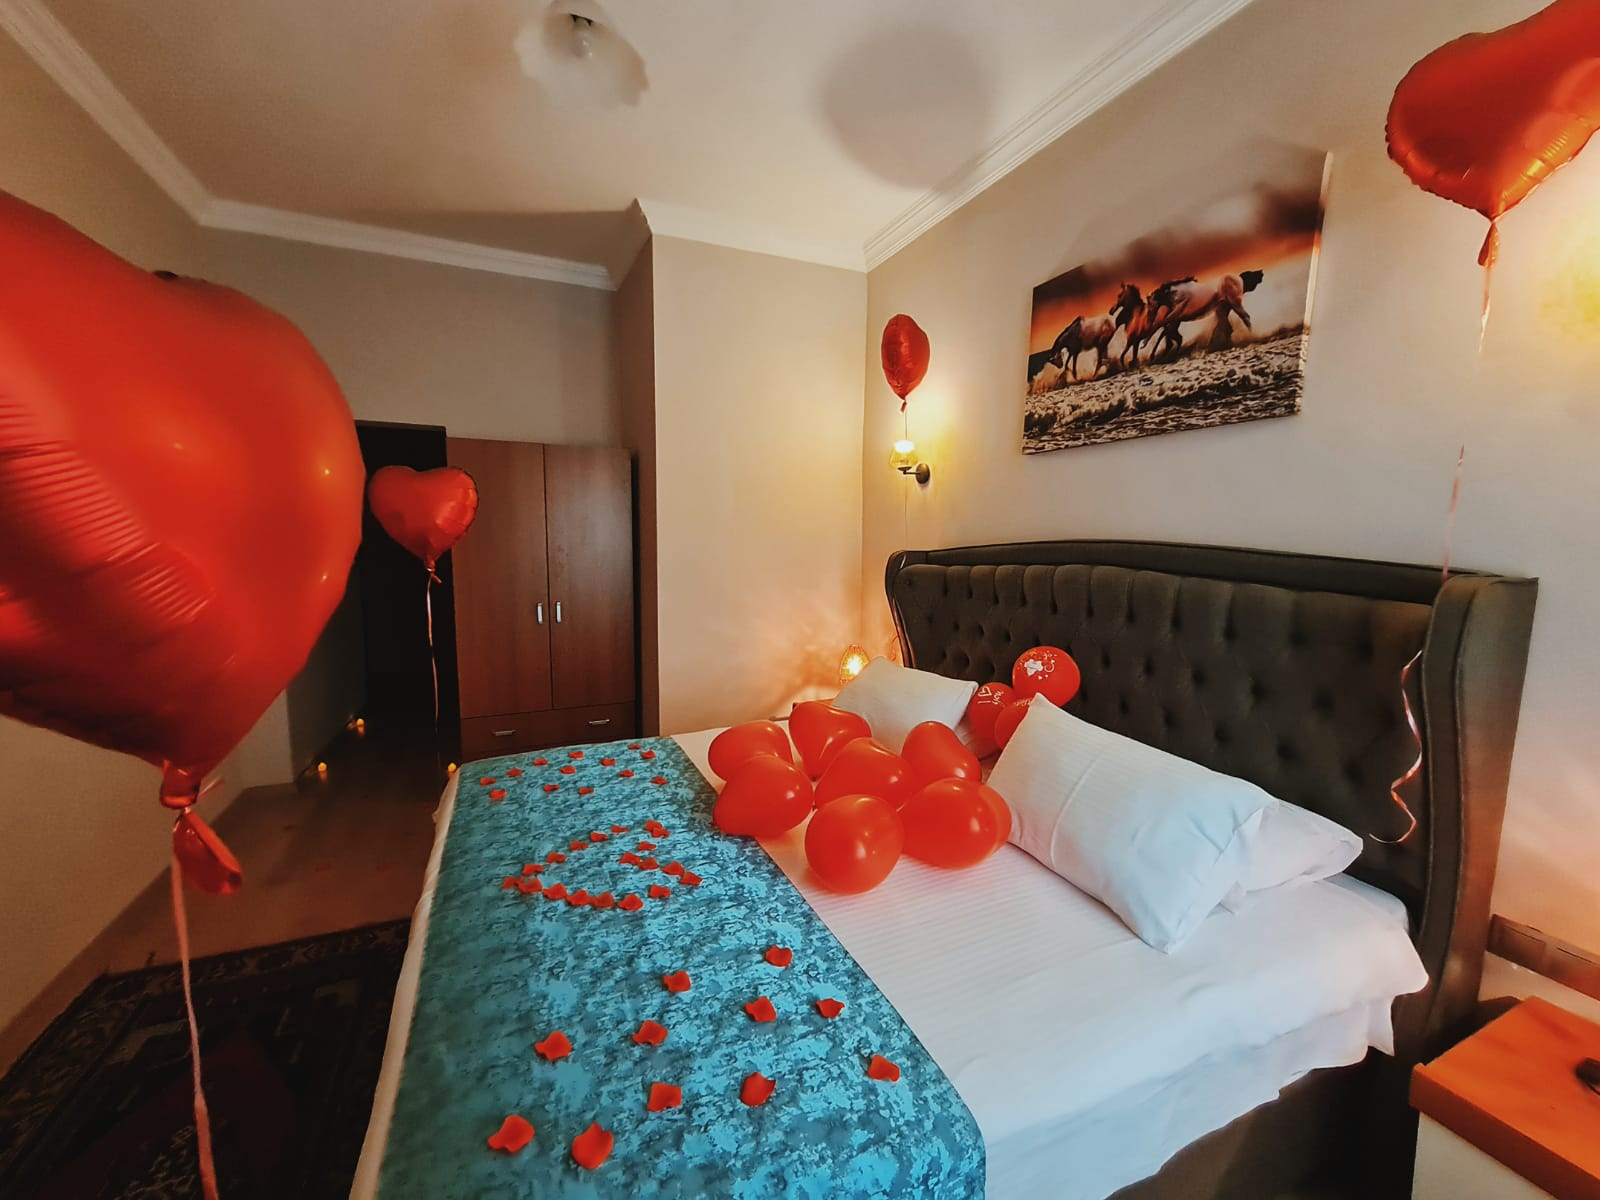 http://yildizhotel.com/wp-content/uploads/Yıldız-Hotel-balayı-3.jpeg